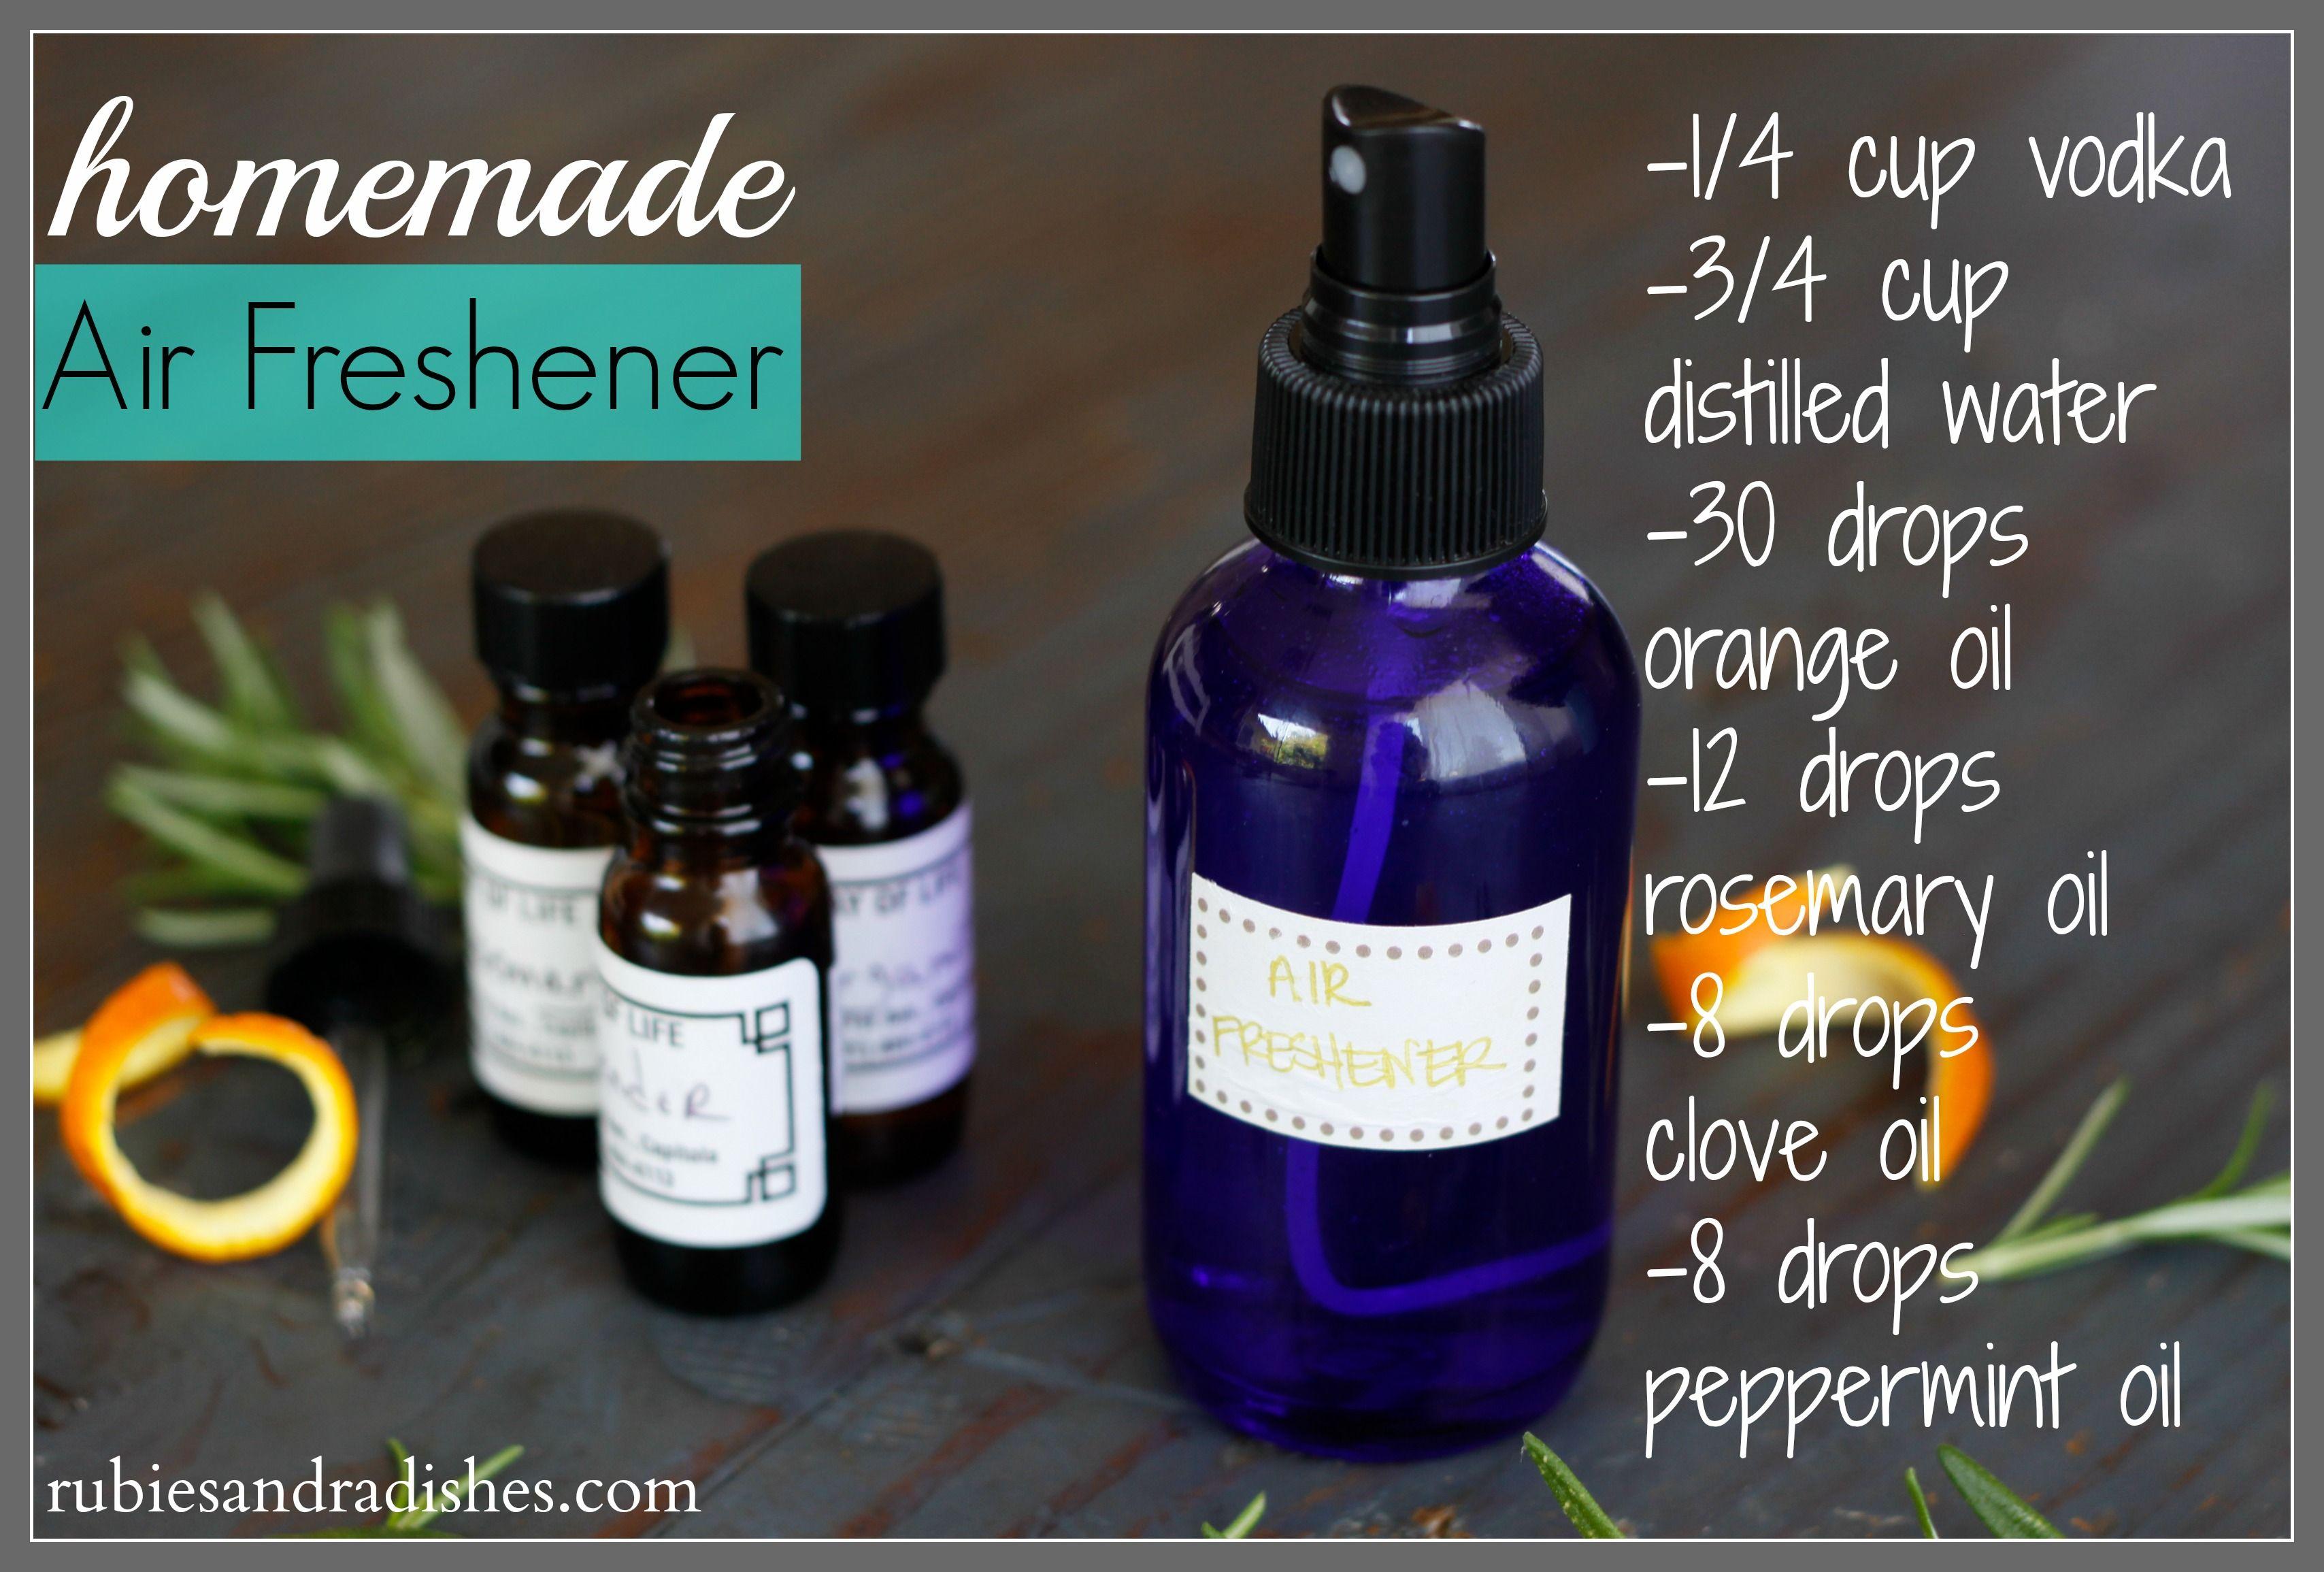 How To Make Homemade Air Freshener  Homemade Air Freshener Air Beauteous Bathroom Air Freshener Review